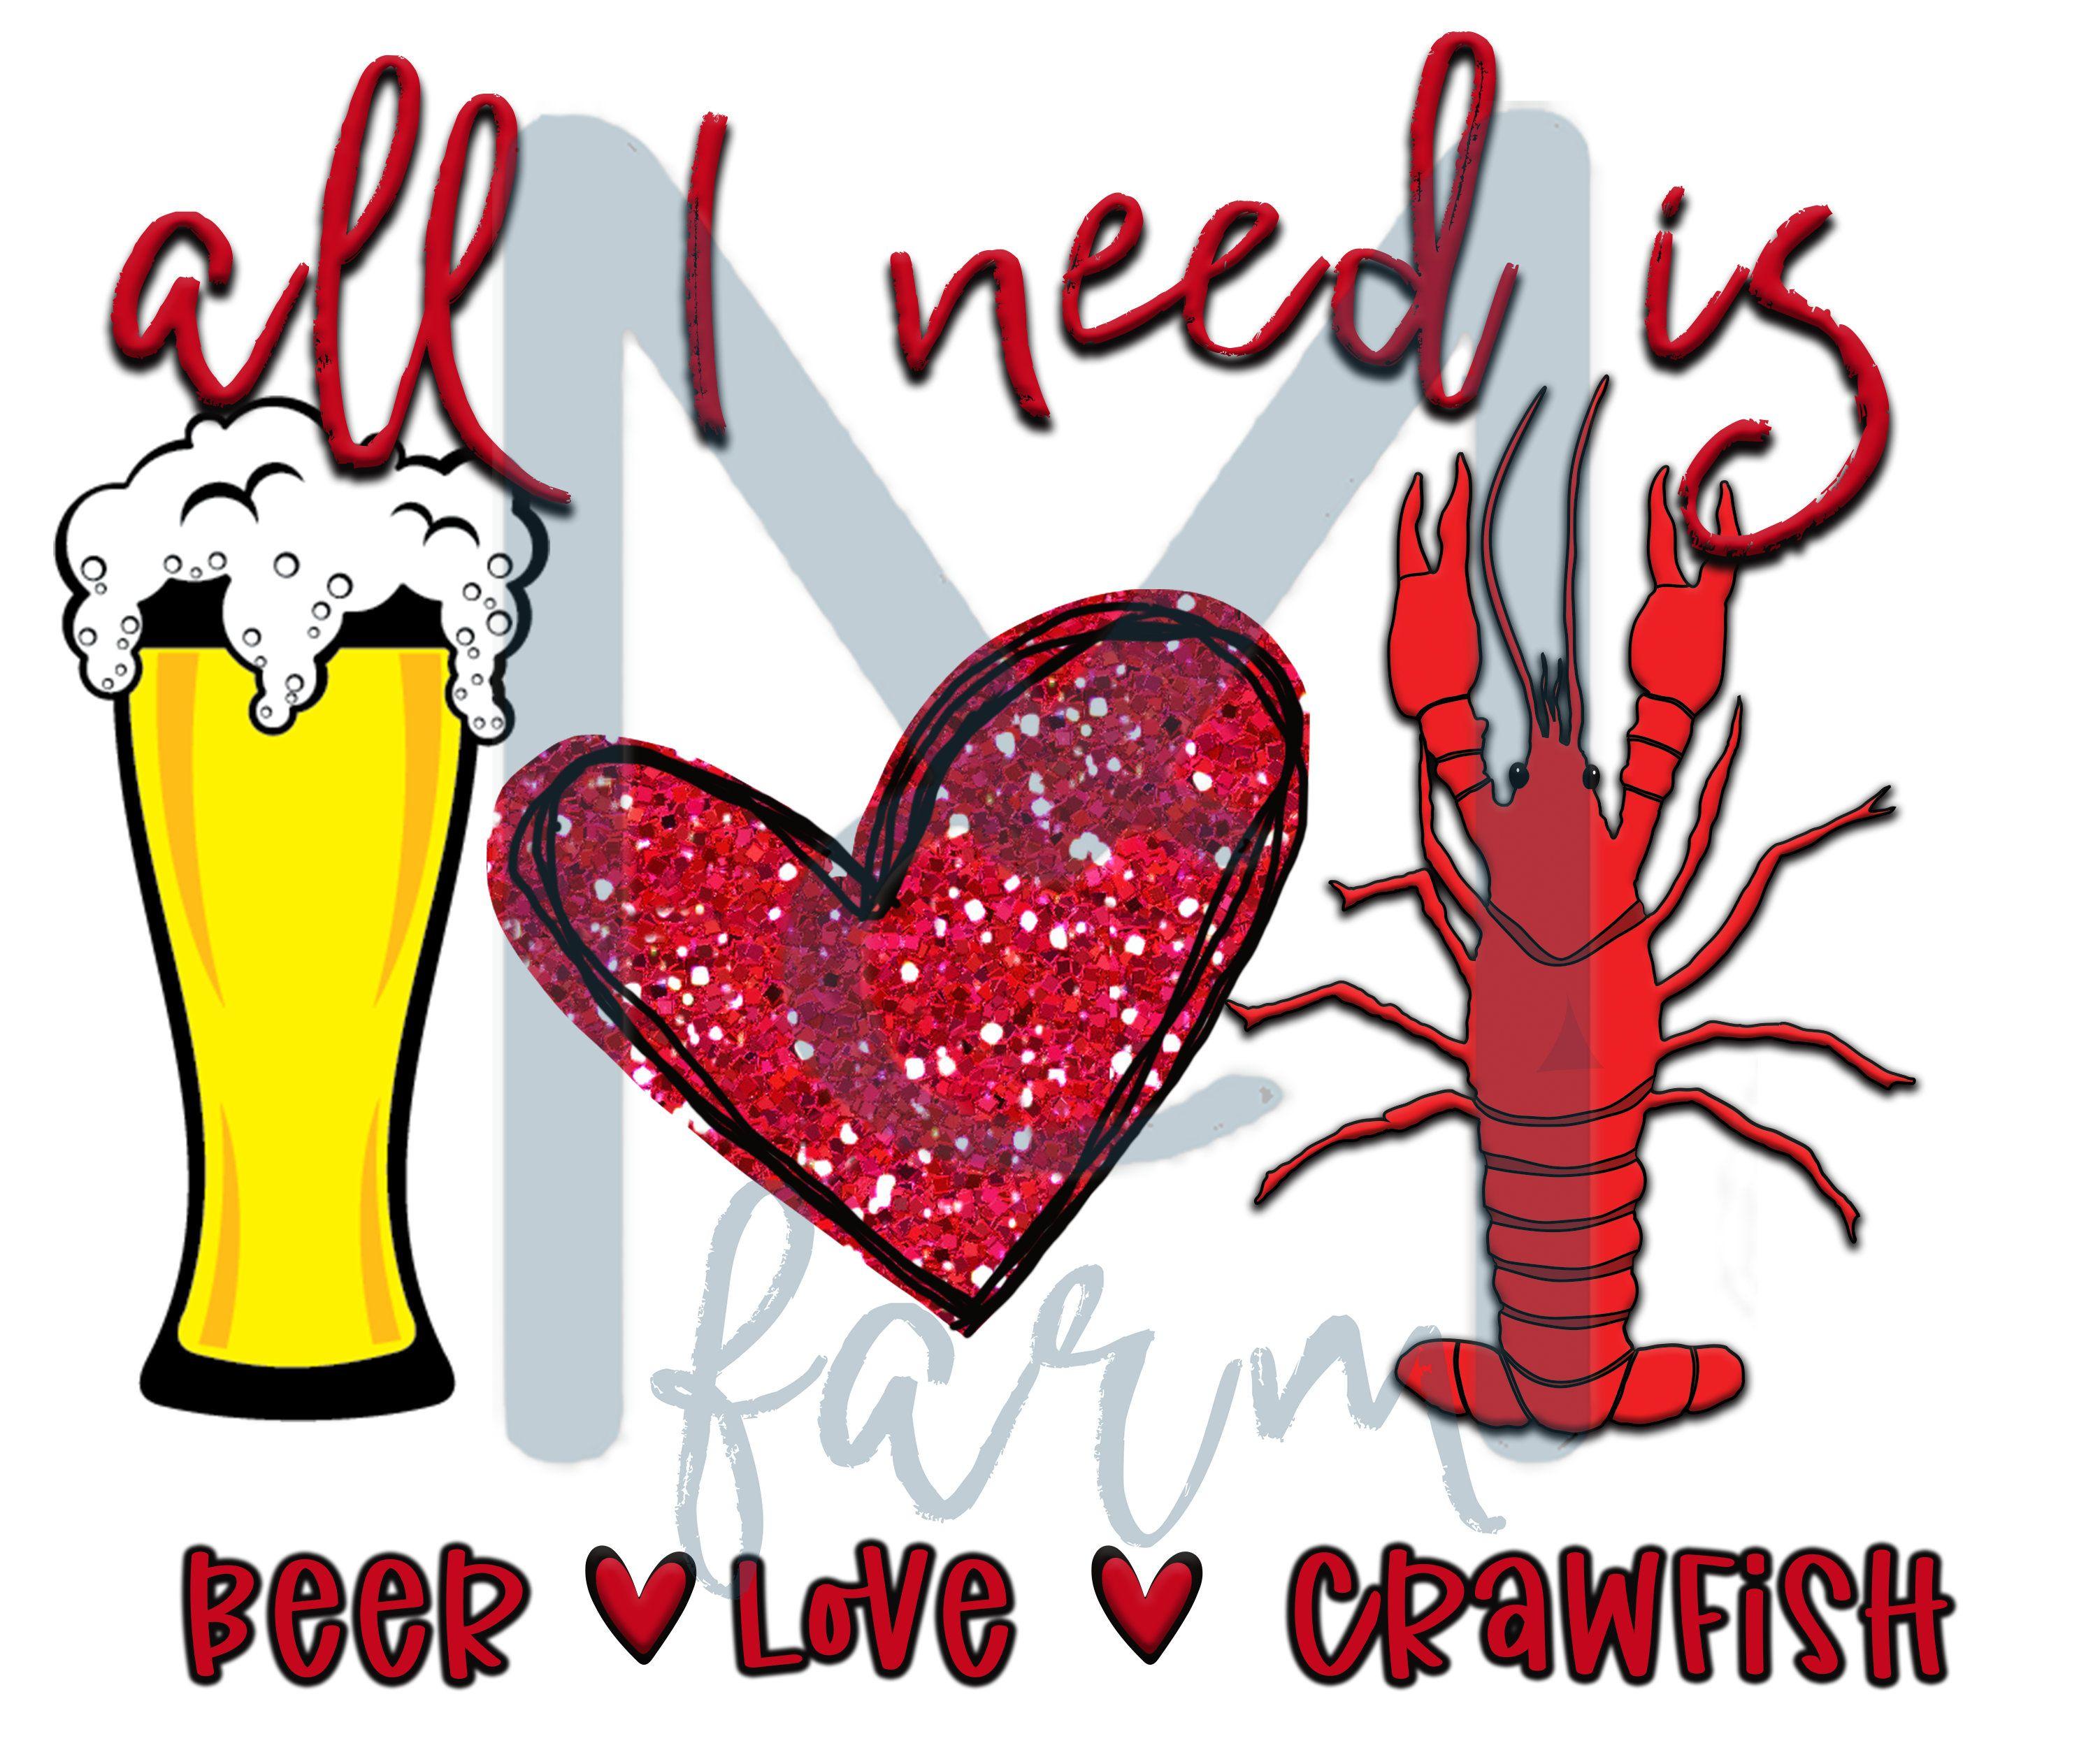 crawfish bleached tshirt Got a little Cajun in my soul crawfish beer shirt crawfish season tee